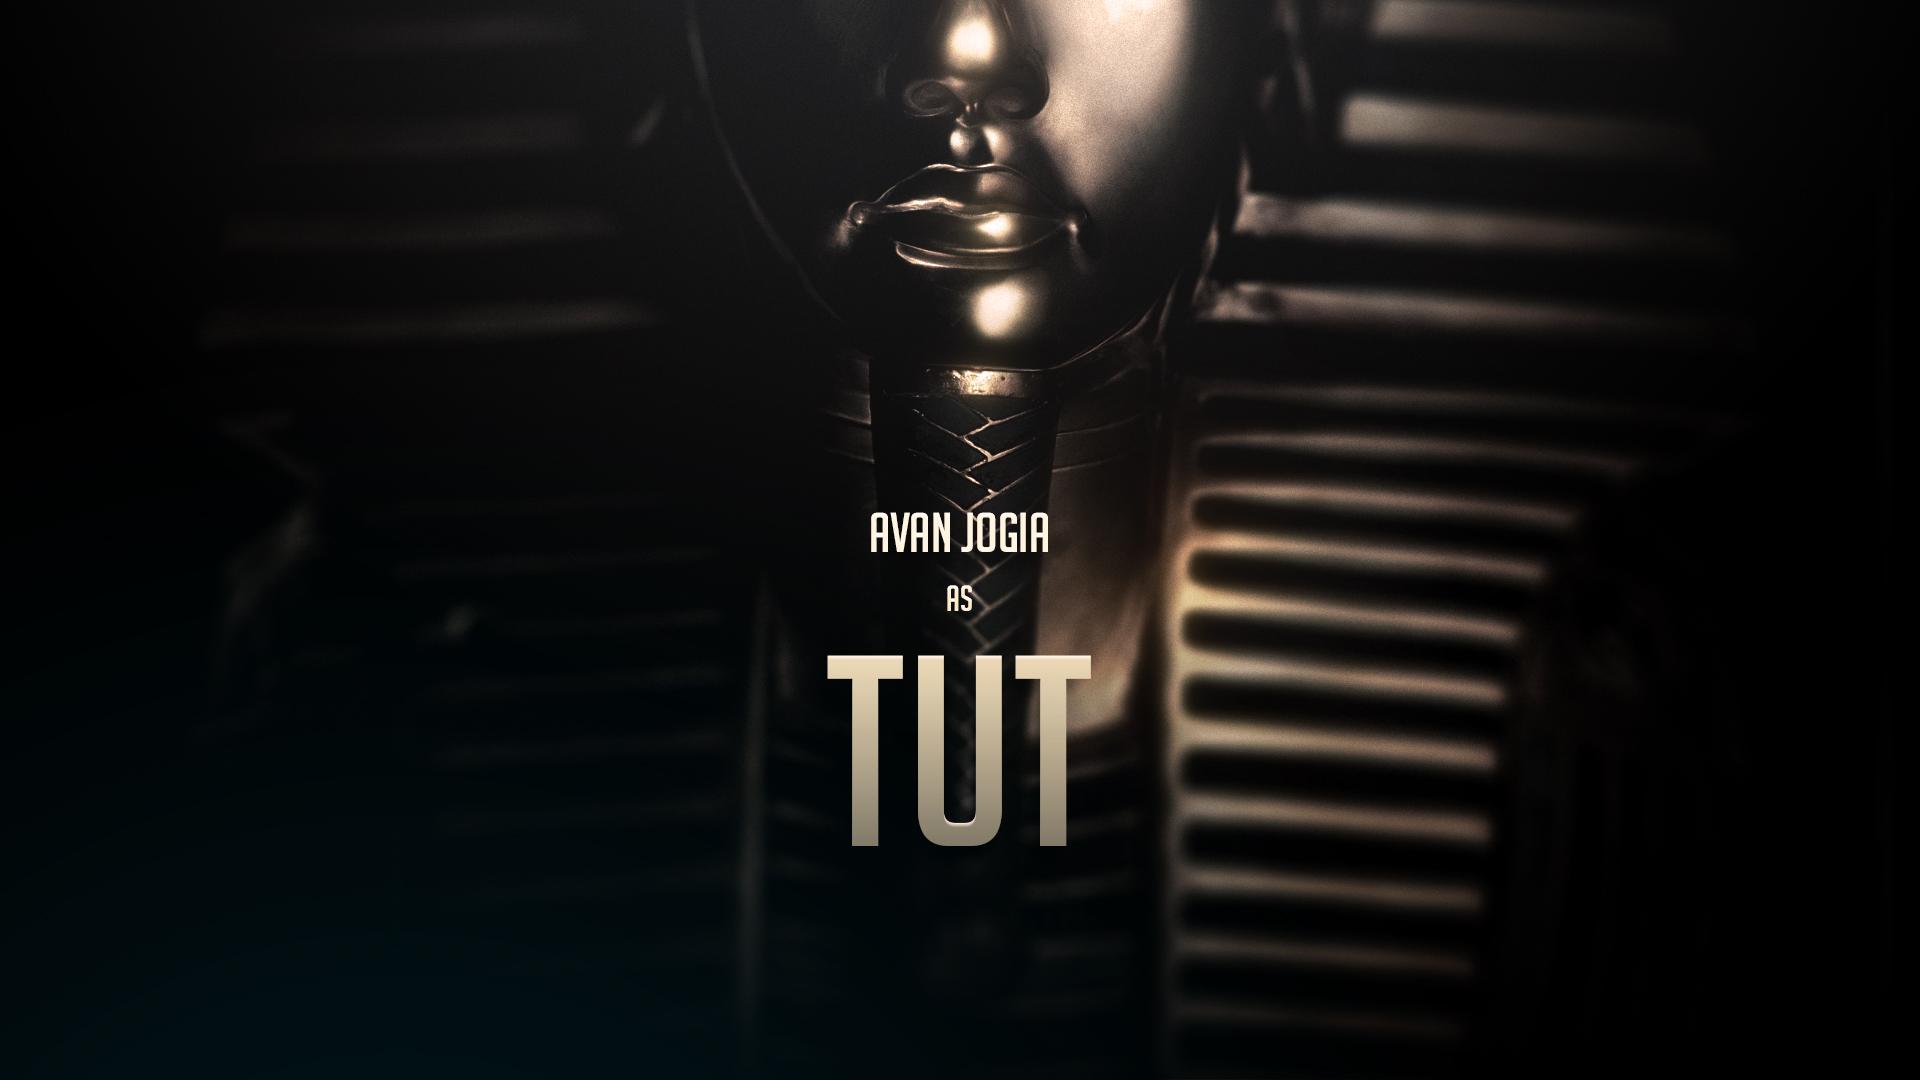 Tut_card_v02_05.jpg